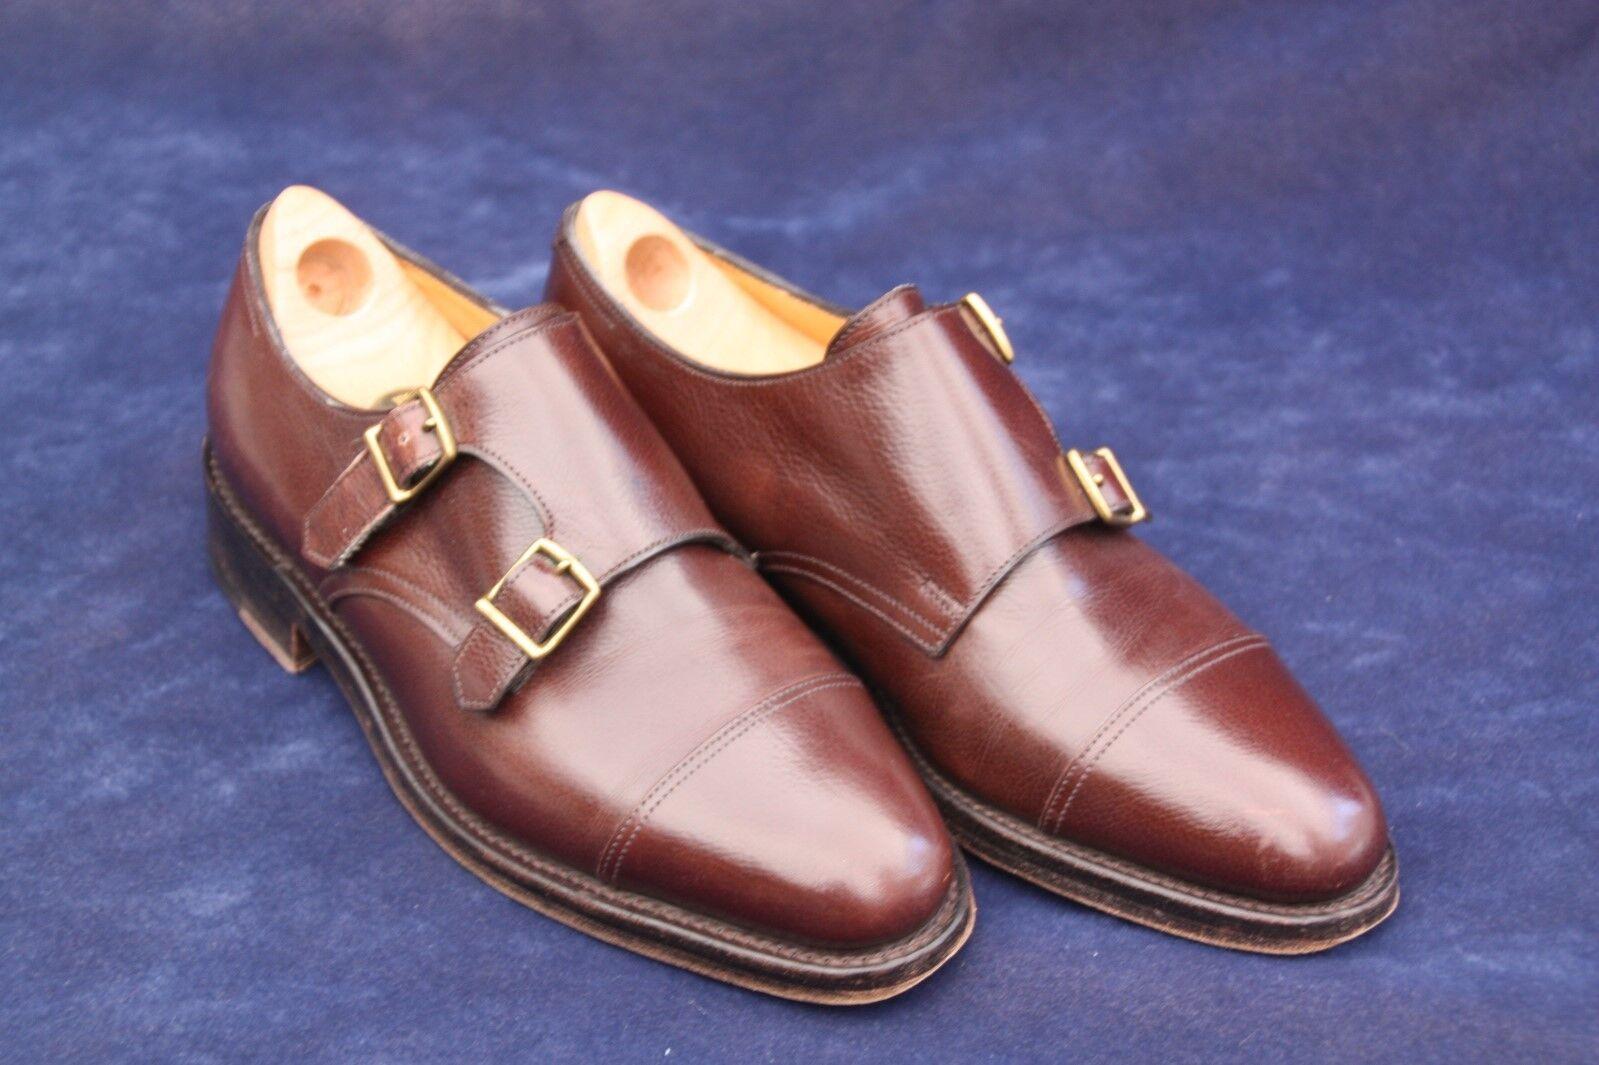 John Lobb Mens Marronee Monk Strap Oxfords 6E US Leather scarpe England + trees